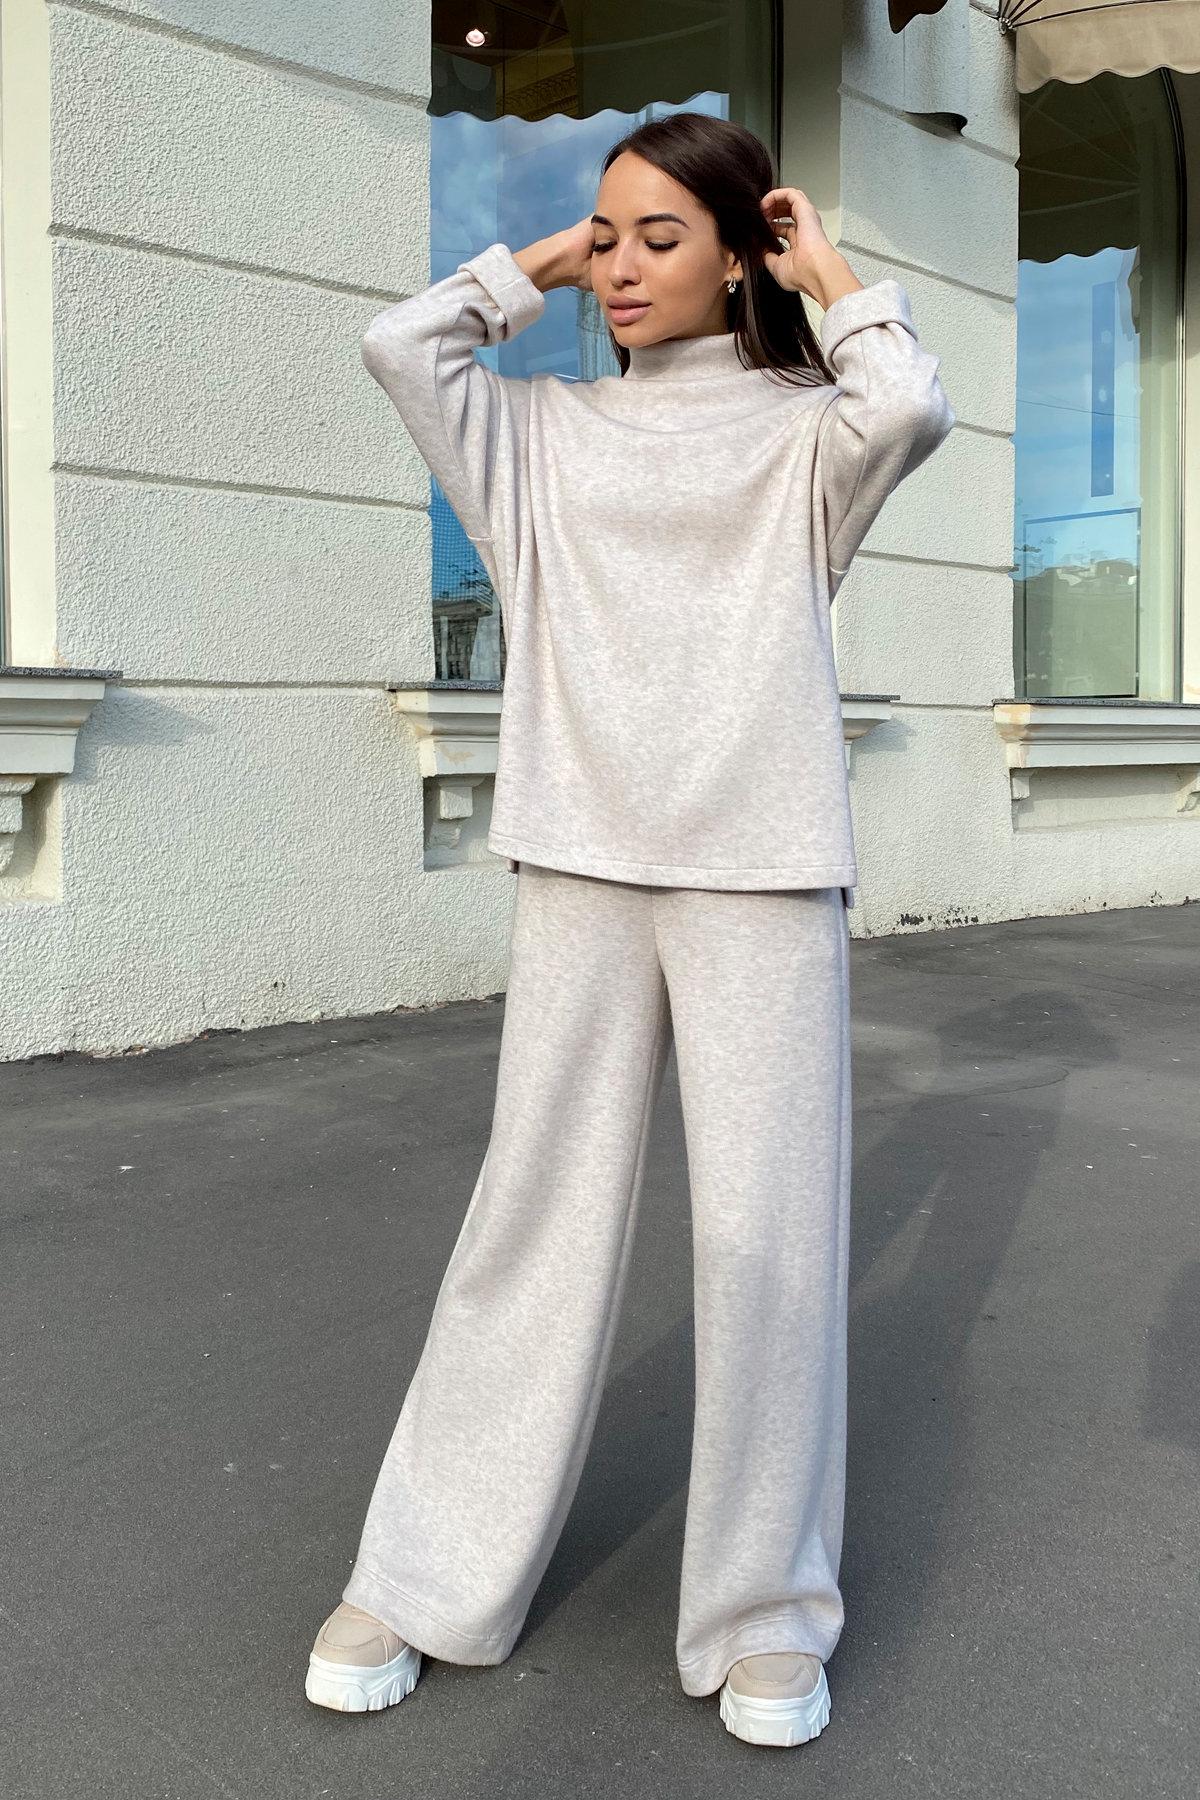 Лав Ю костюм из ангоры 9806 АРТ. 46093 Цвет: Бежевый - фото 3, интернет магазин tm-modus.ru